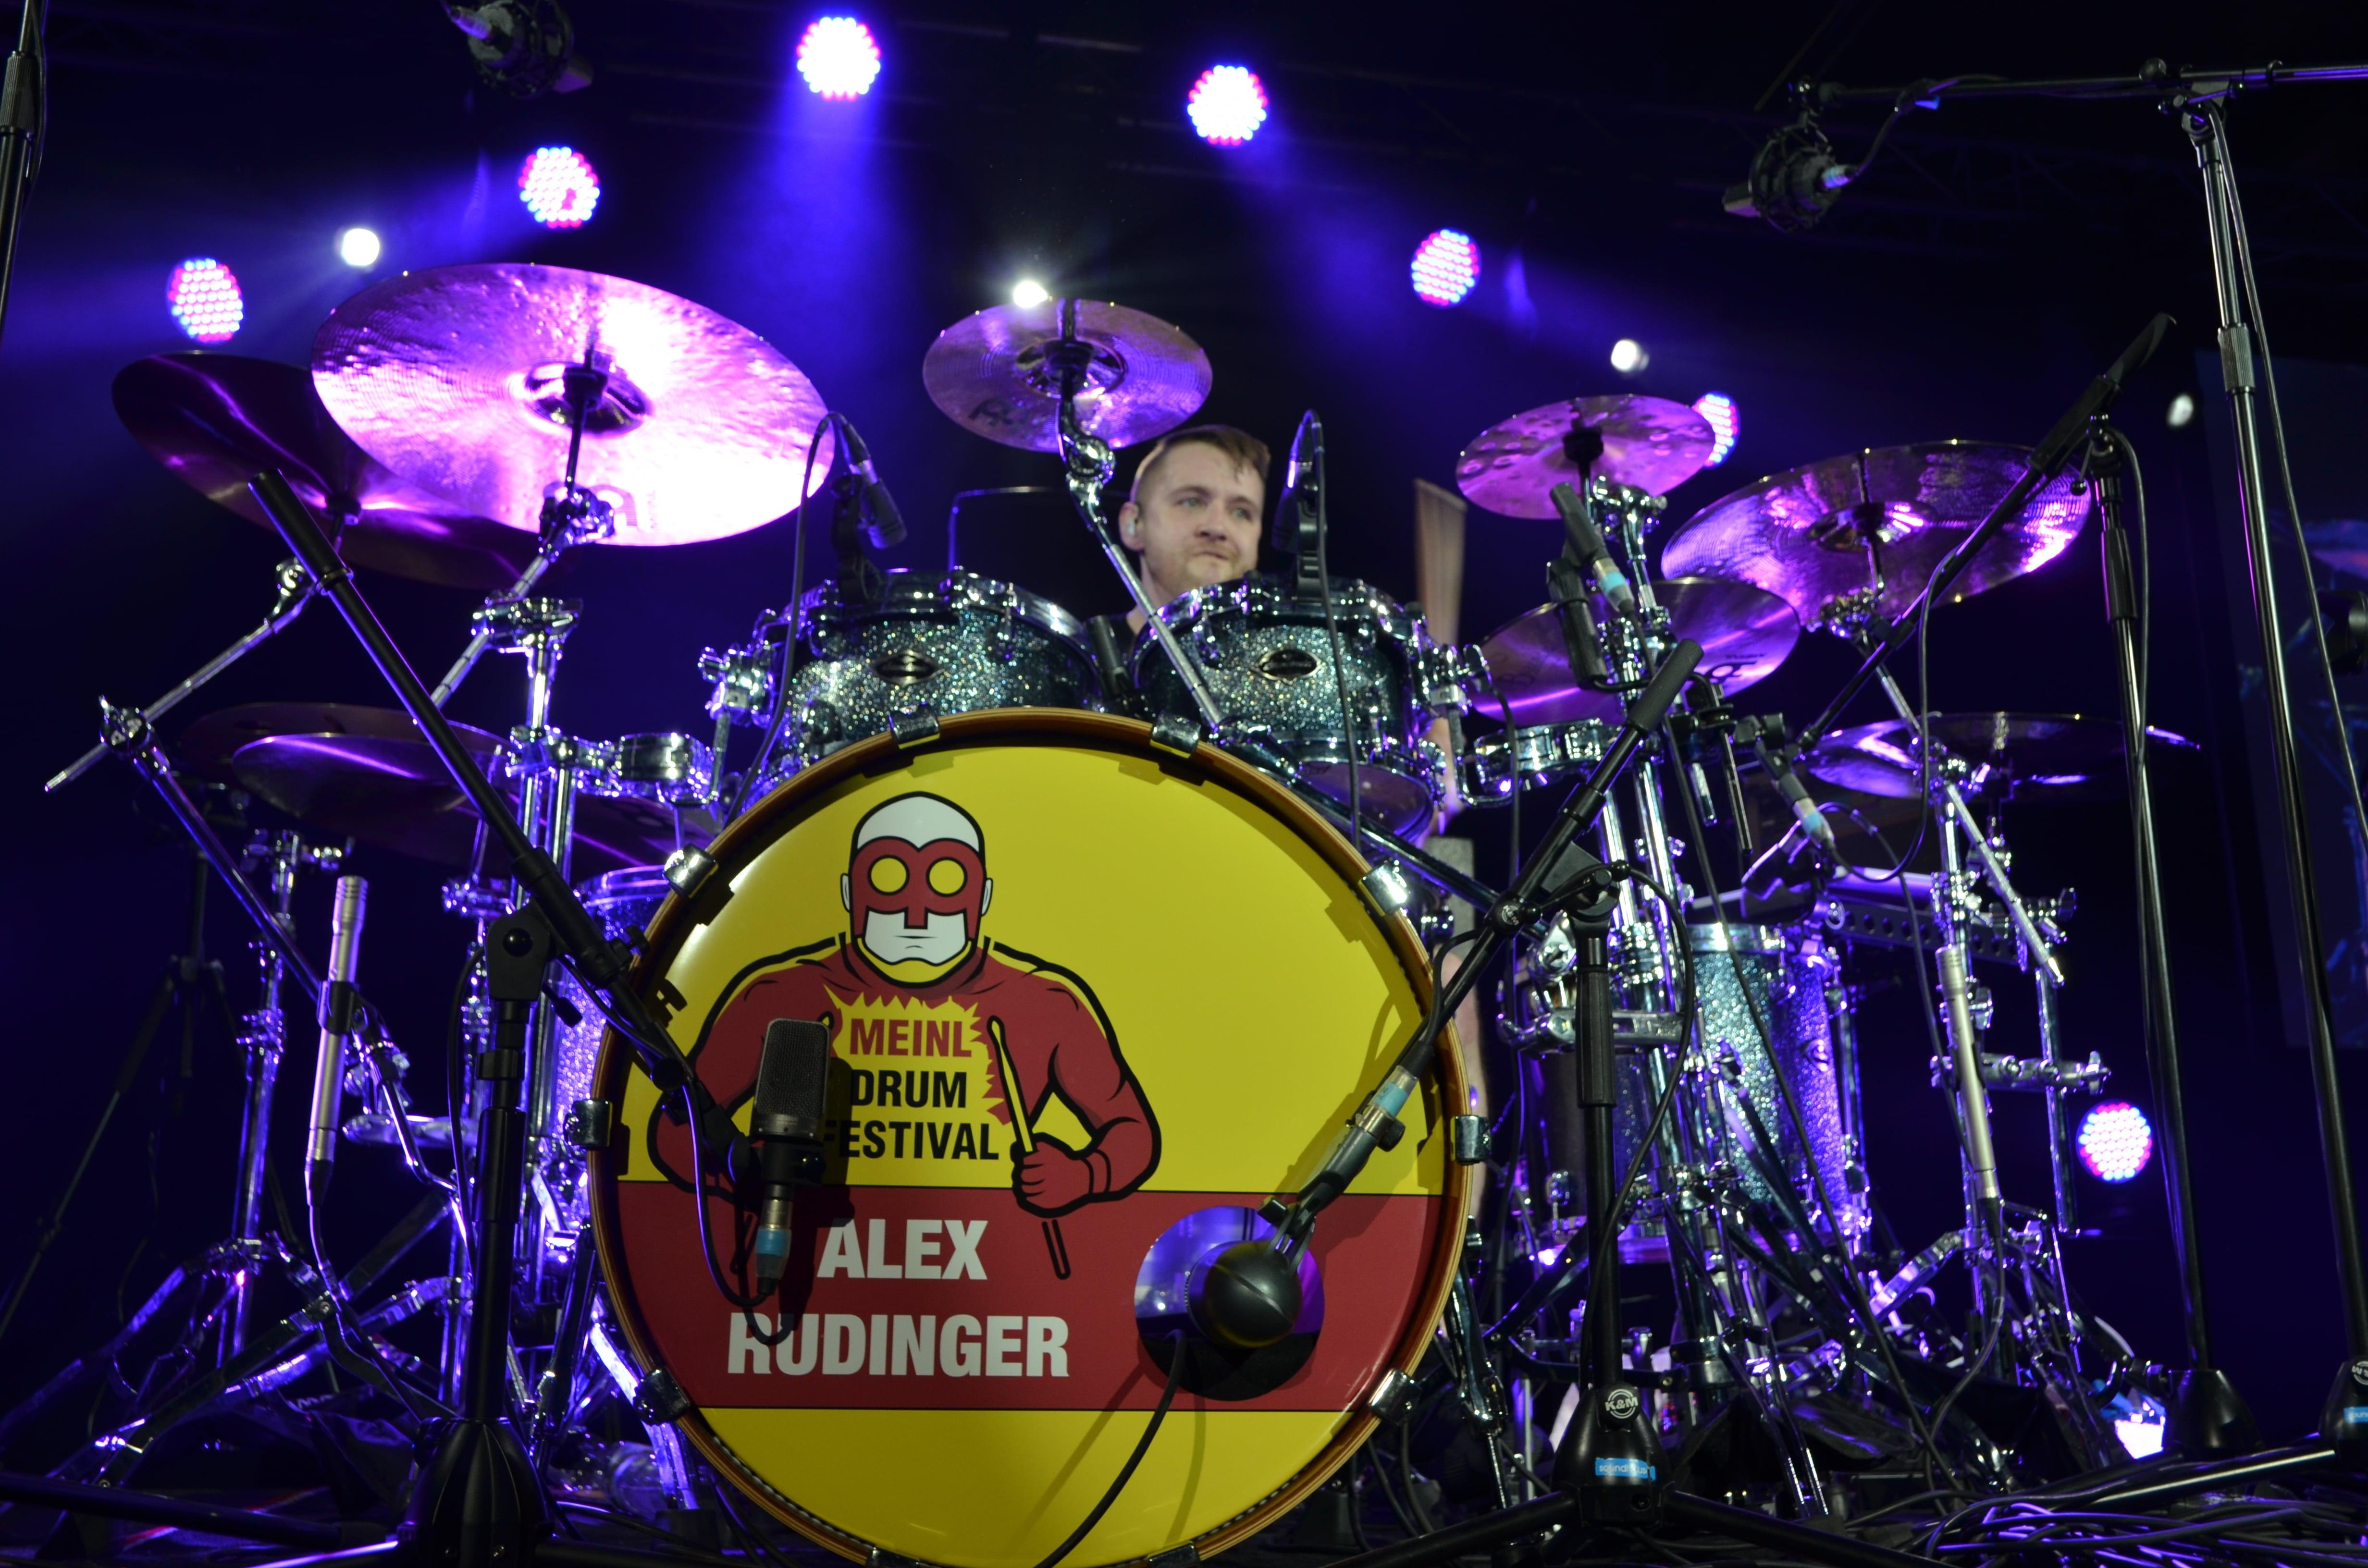 Meinl Alex Rudinger